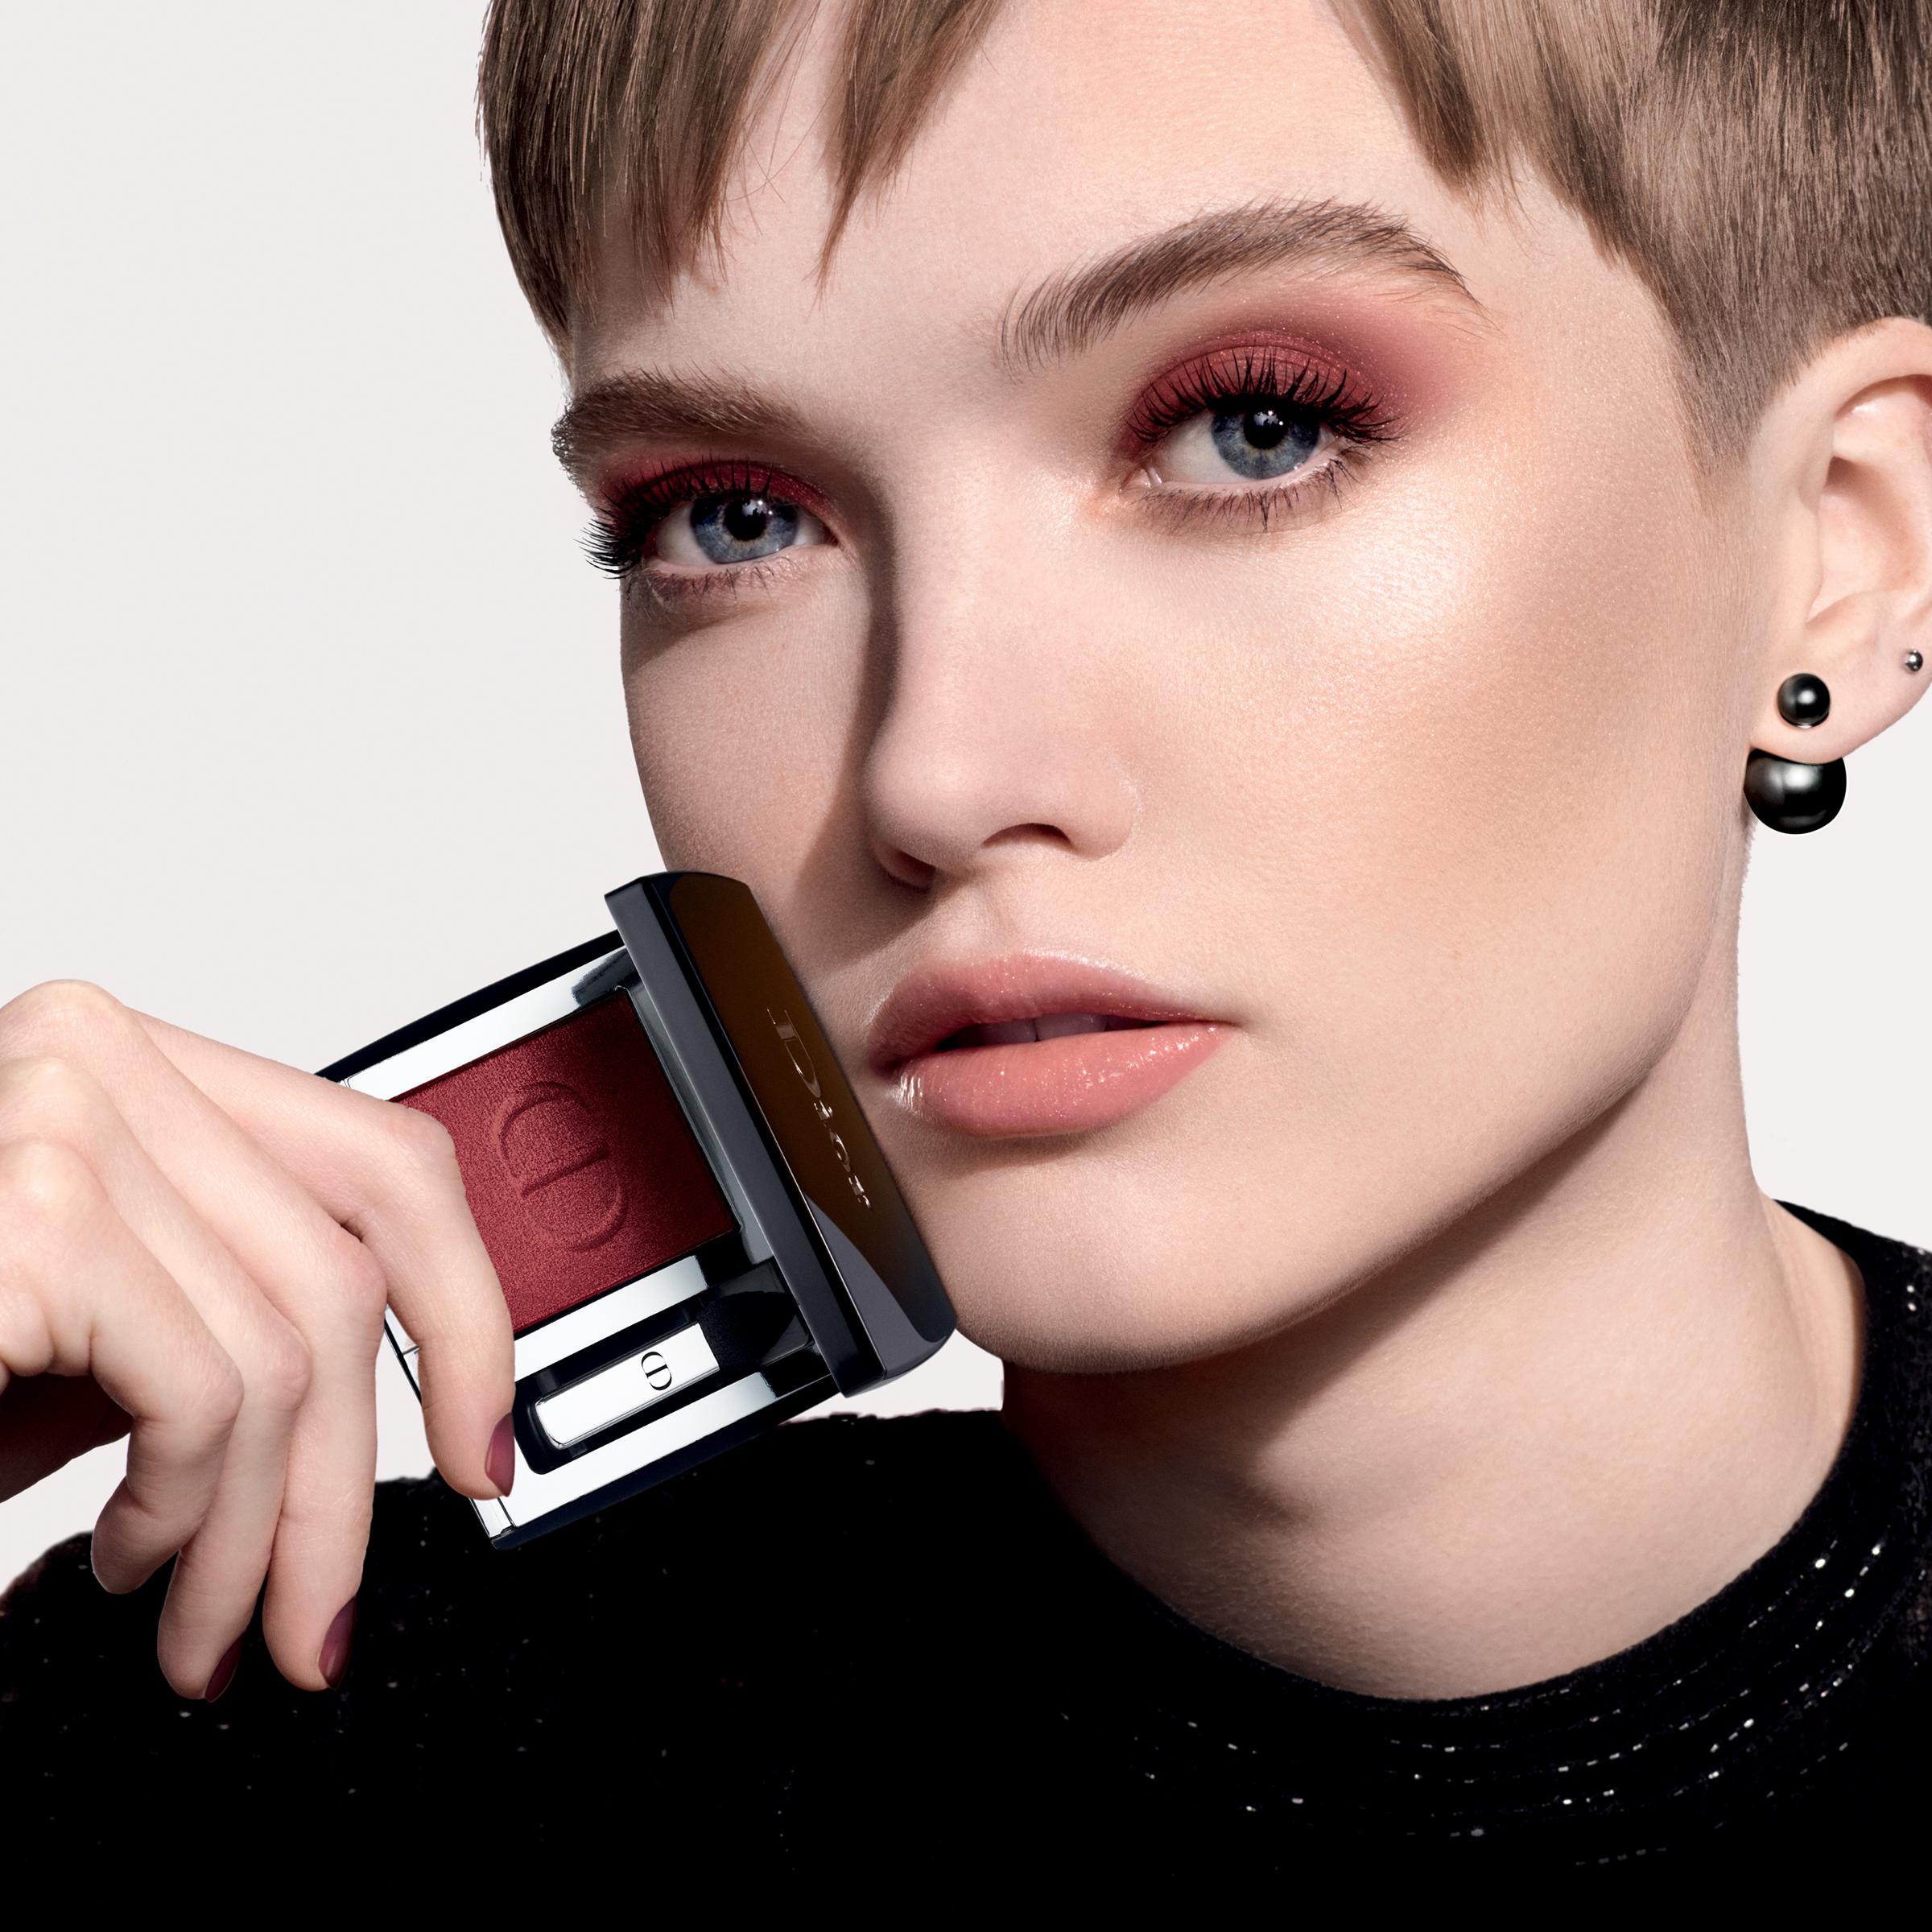 DIOR Diorshow Kabuki Brow Styler, 032 dark brown